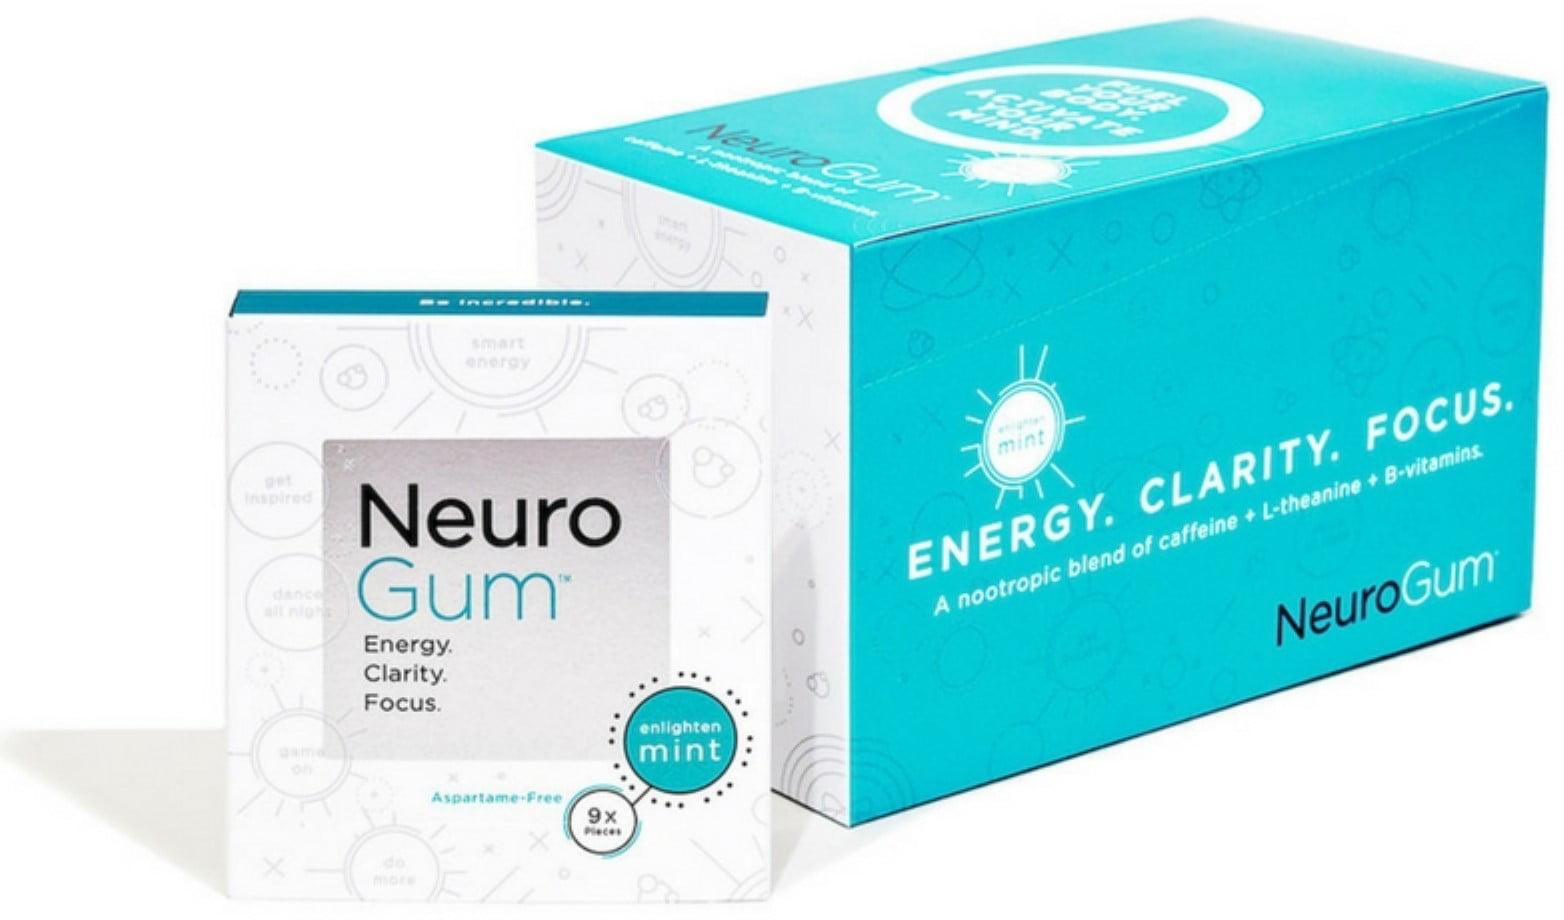 2 Pack - NeuroGum Nootropic Energy Gum, Enlighten Mint Flavor, 9 Pieces Per  Pack (12 Pack)